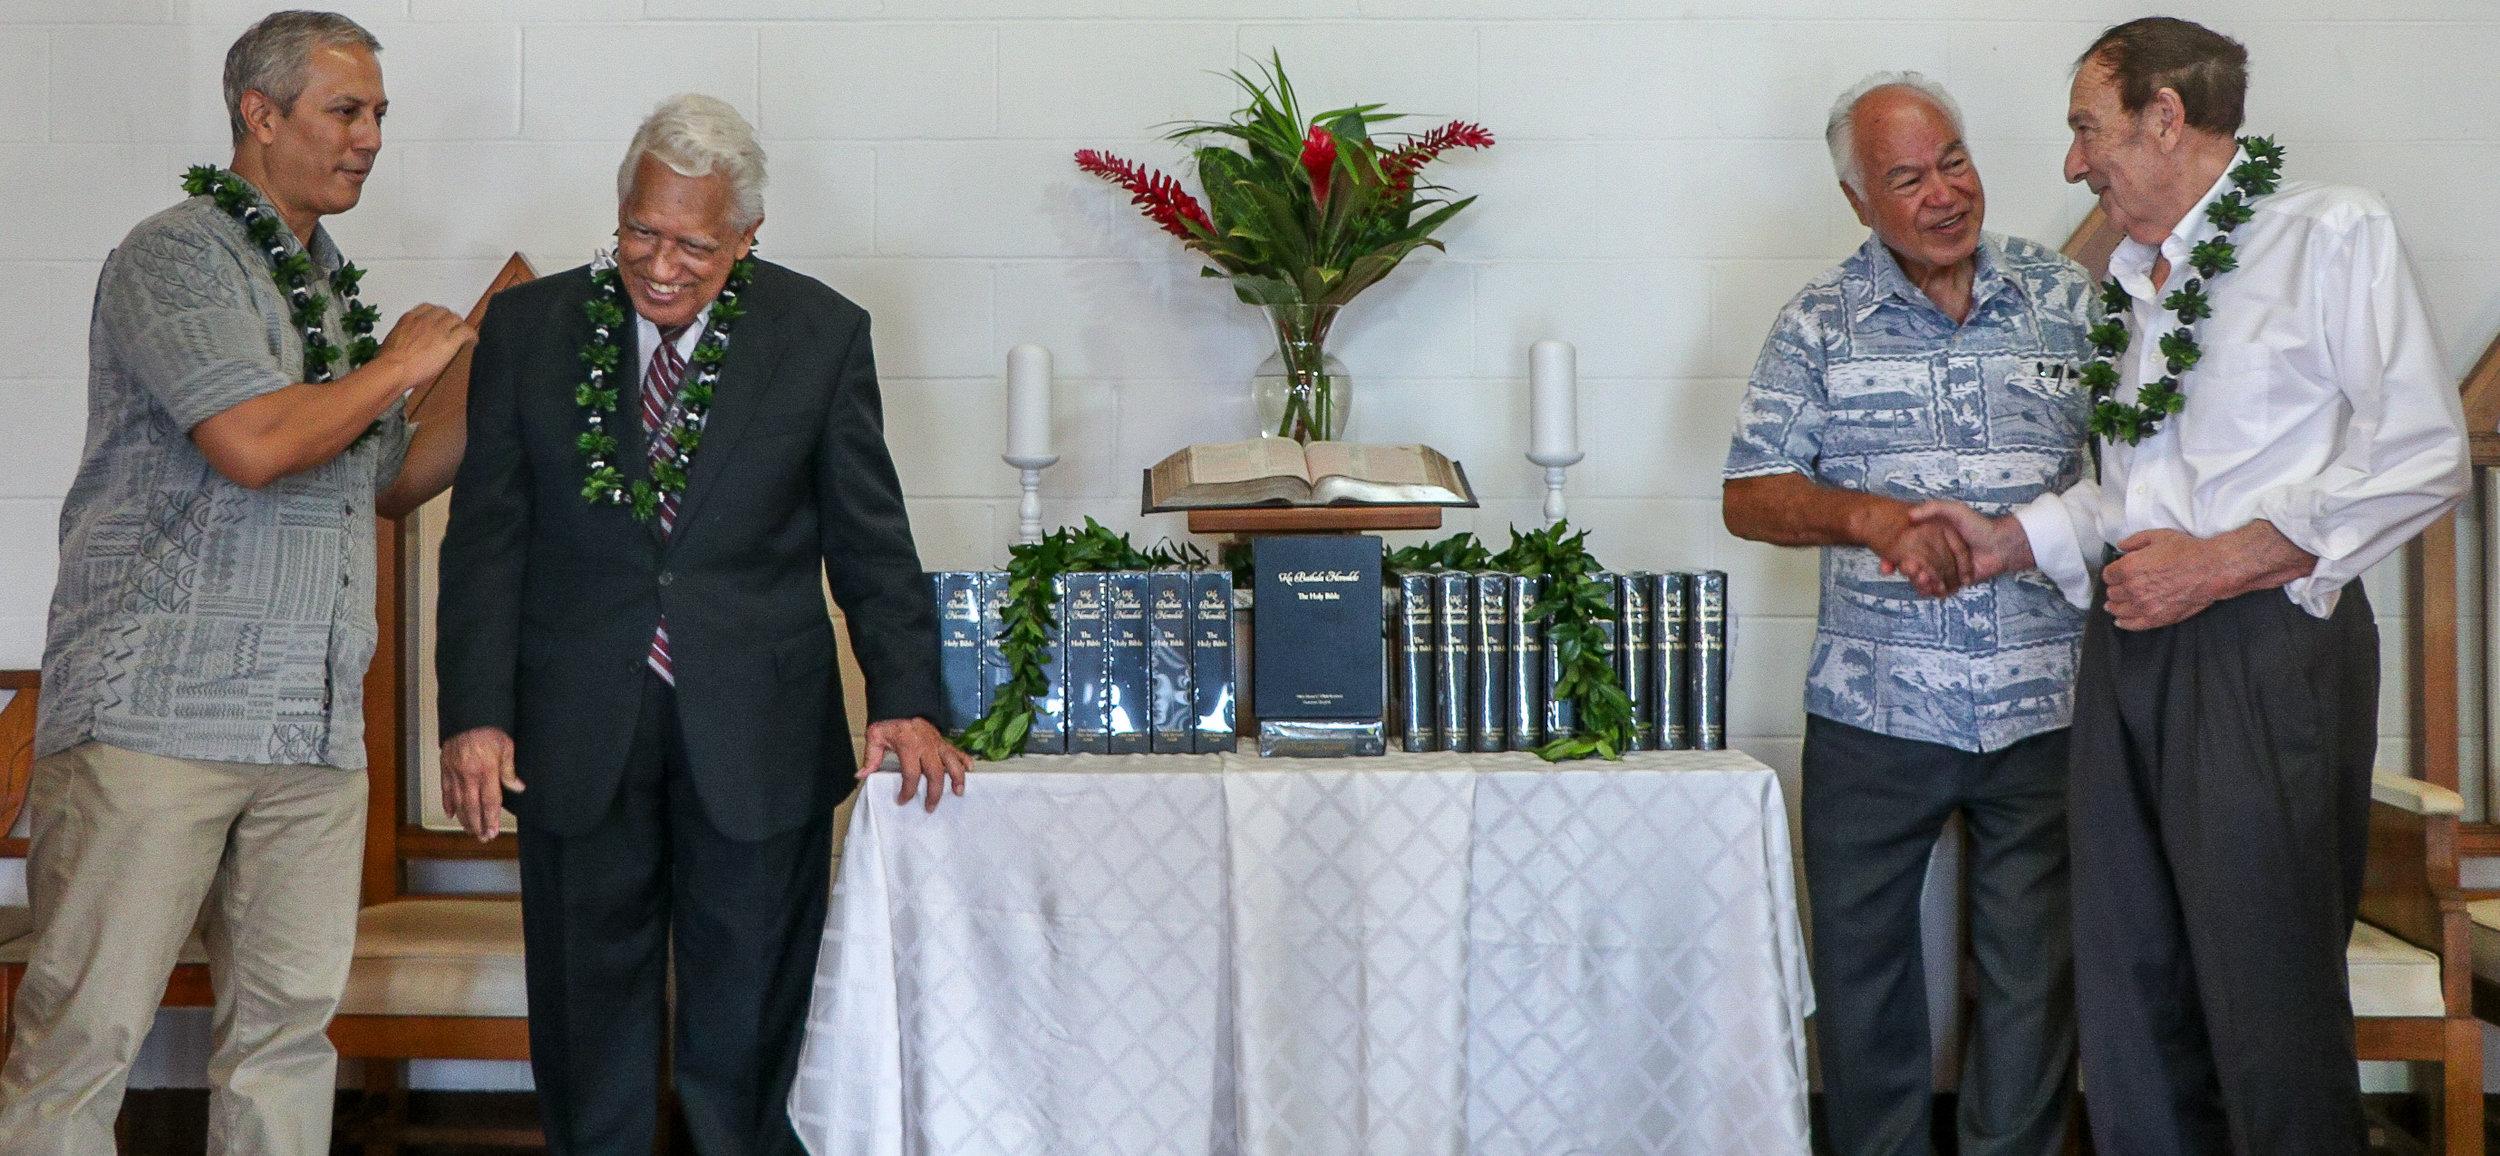 Kevin Cockett, Kamehameha Schools Vice President of Communications and Chief Communications Officer, Kahu David Kaupu, Kahu Kimo Merseberg, and Bennett Hymer, Mutual Publishing